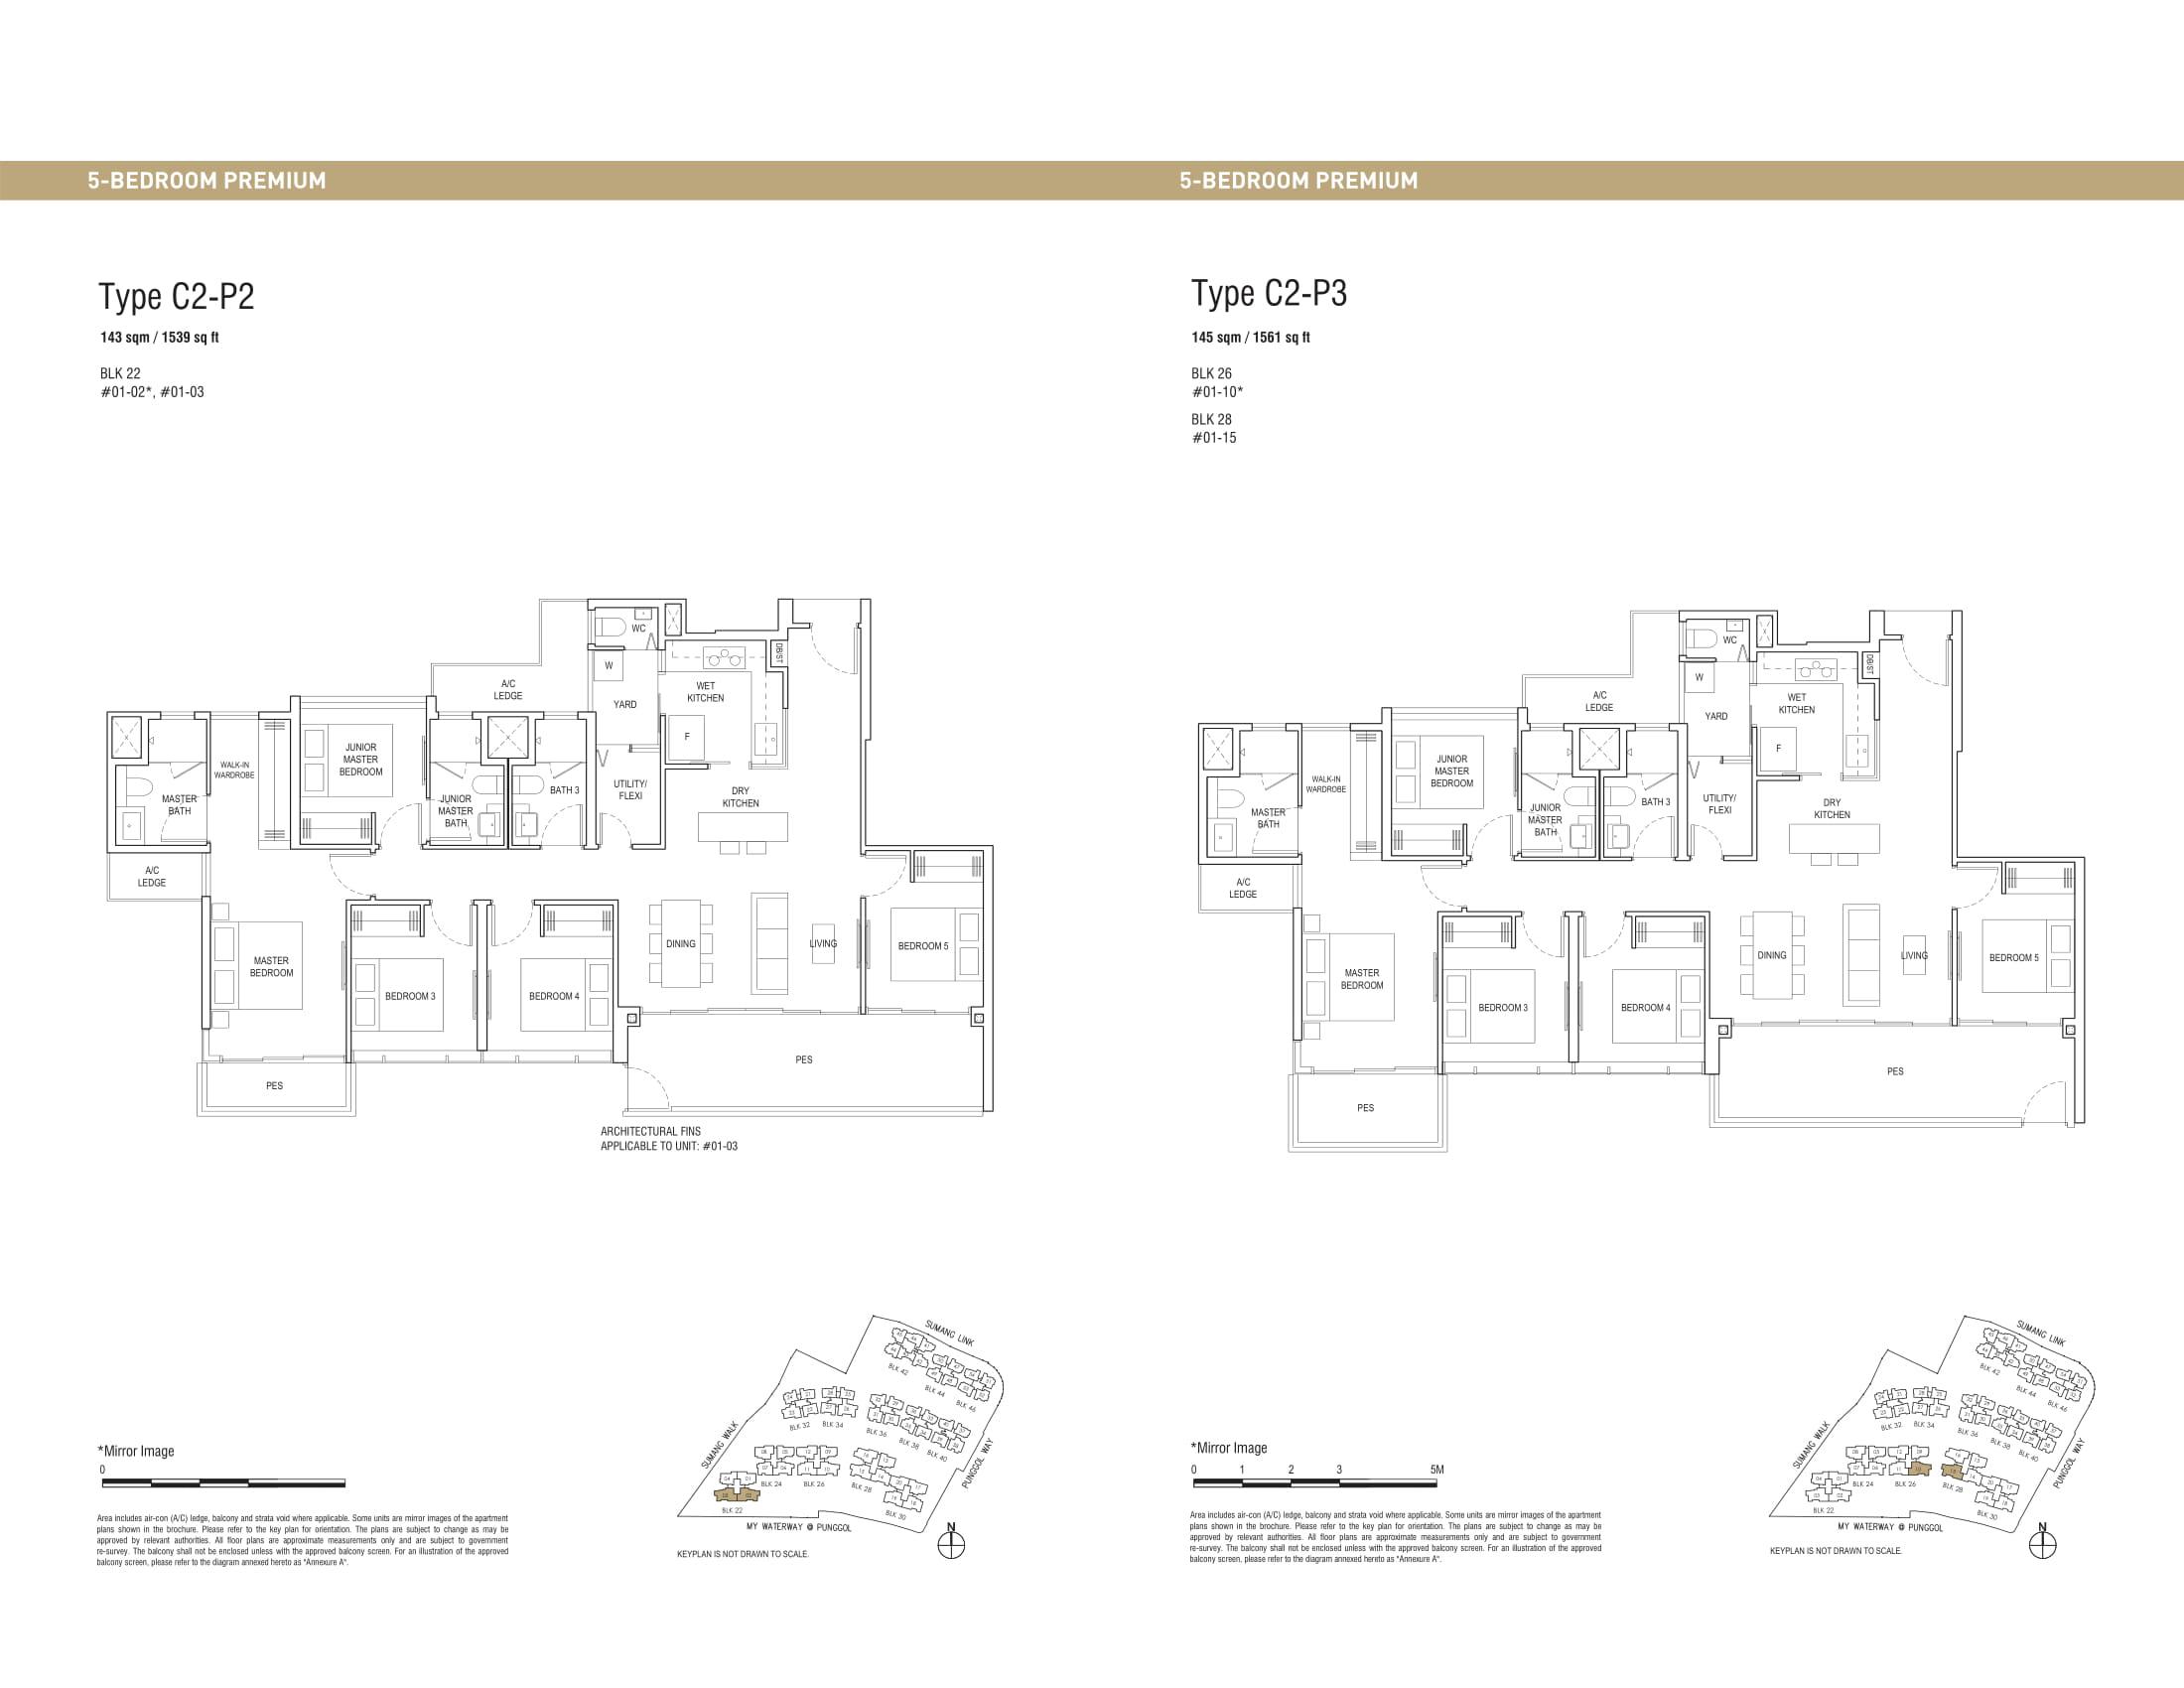 Piermont Grand EC's five-bedroom premium and five-bedroom premium penthouse types